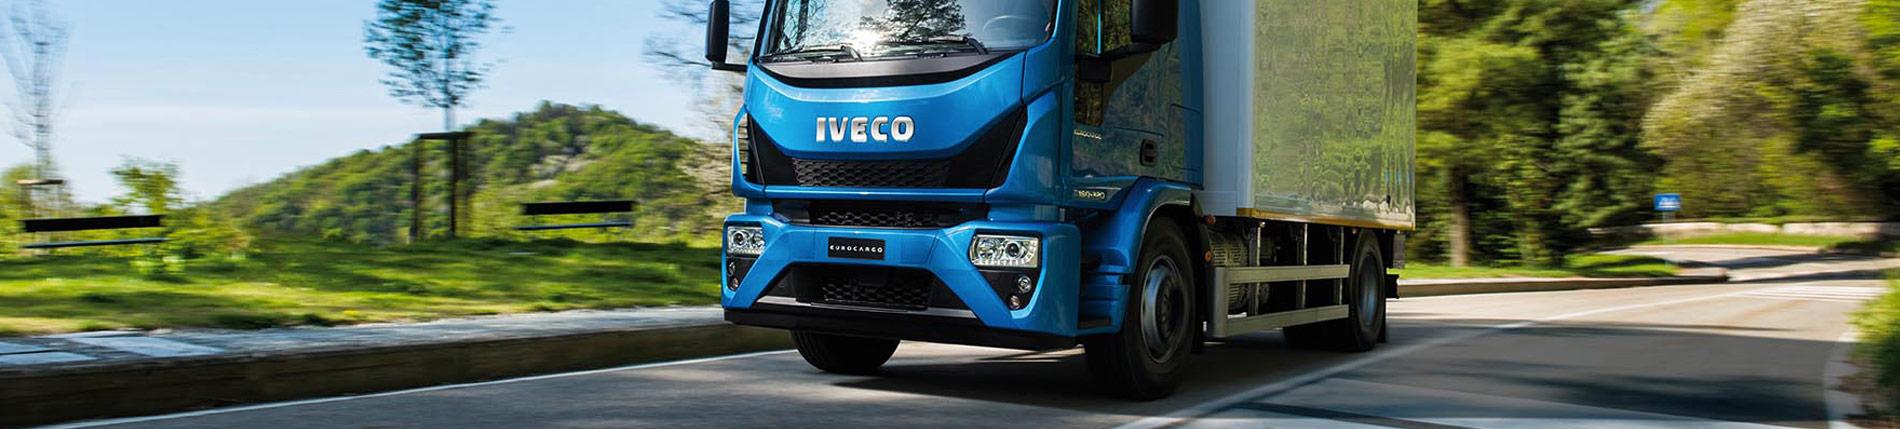 Nuovo Iveco Eurocargo